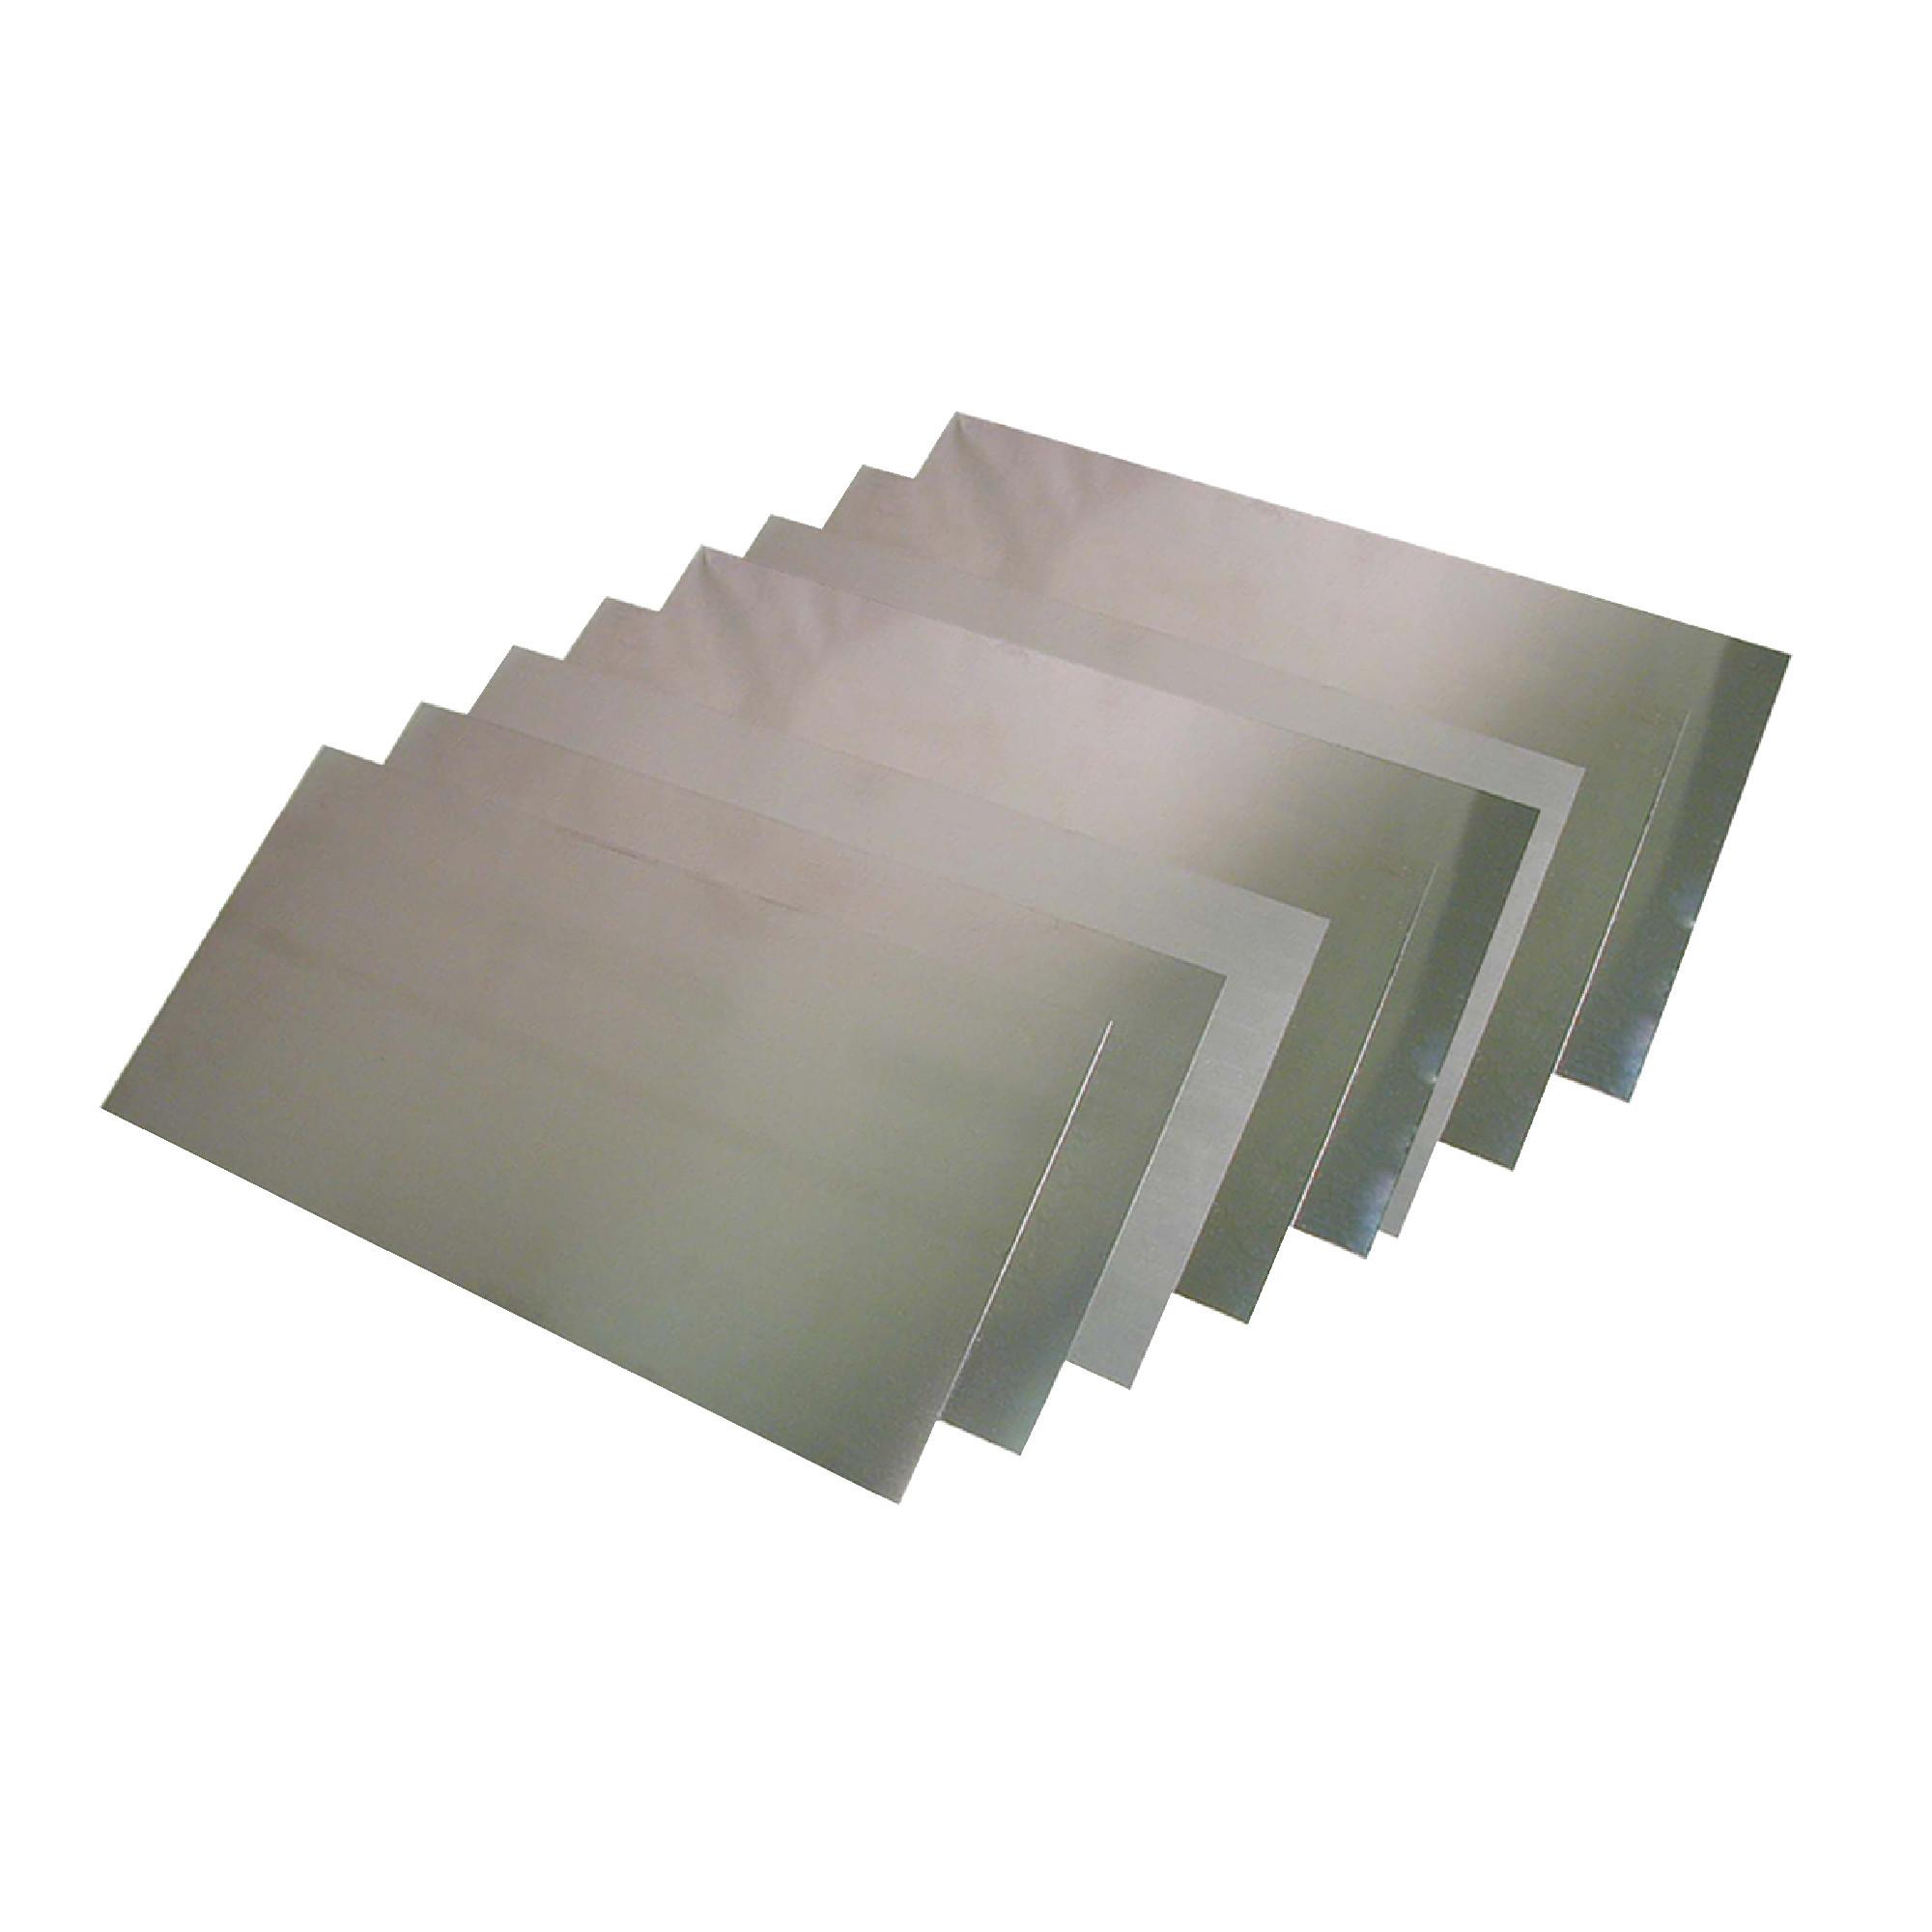 Stainless Steel Shim Sheet Stock Assortment